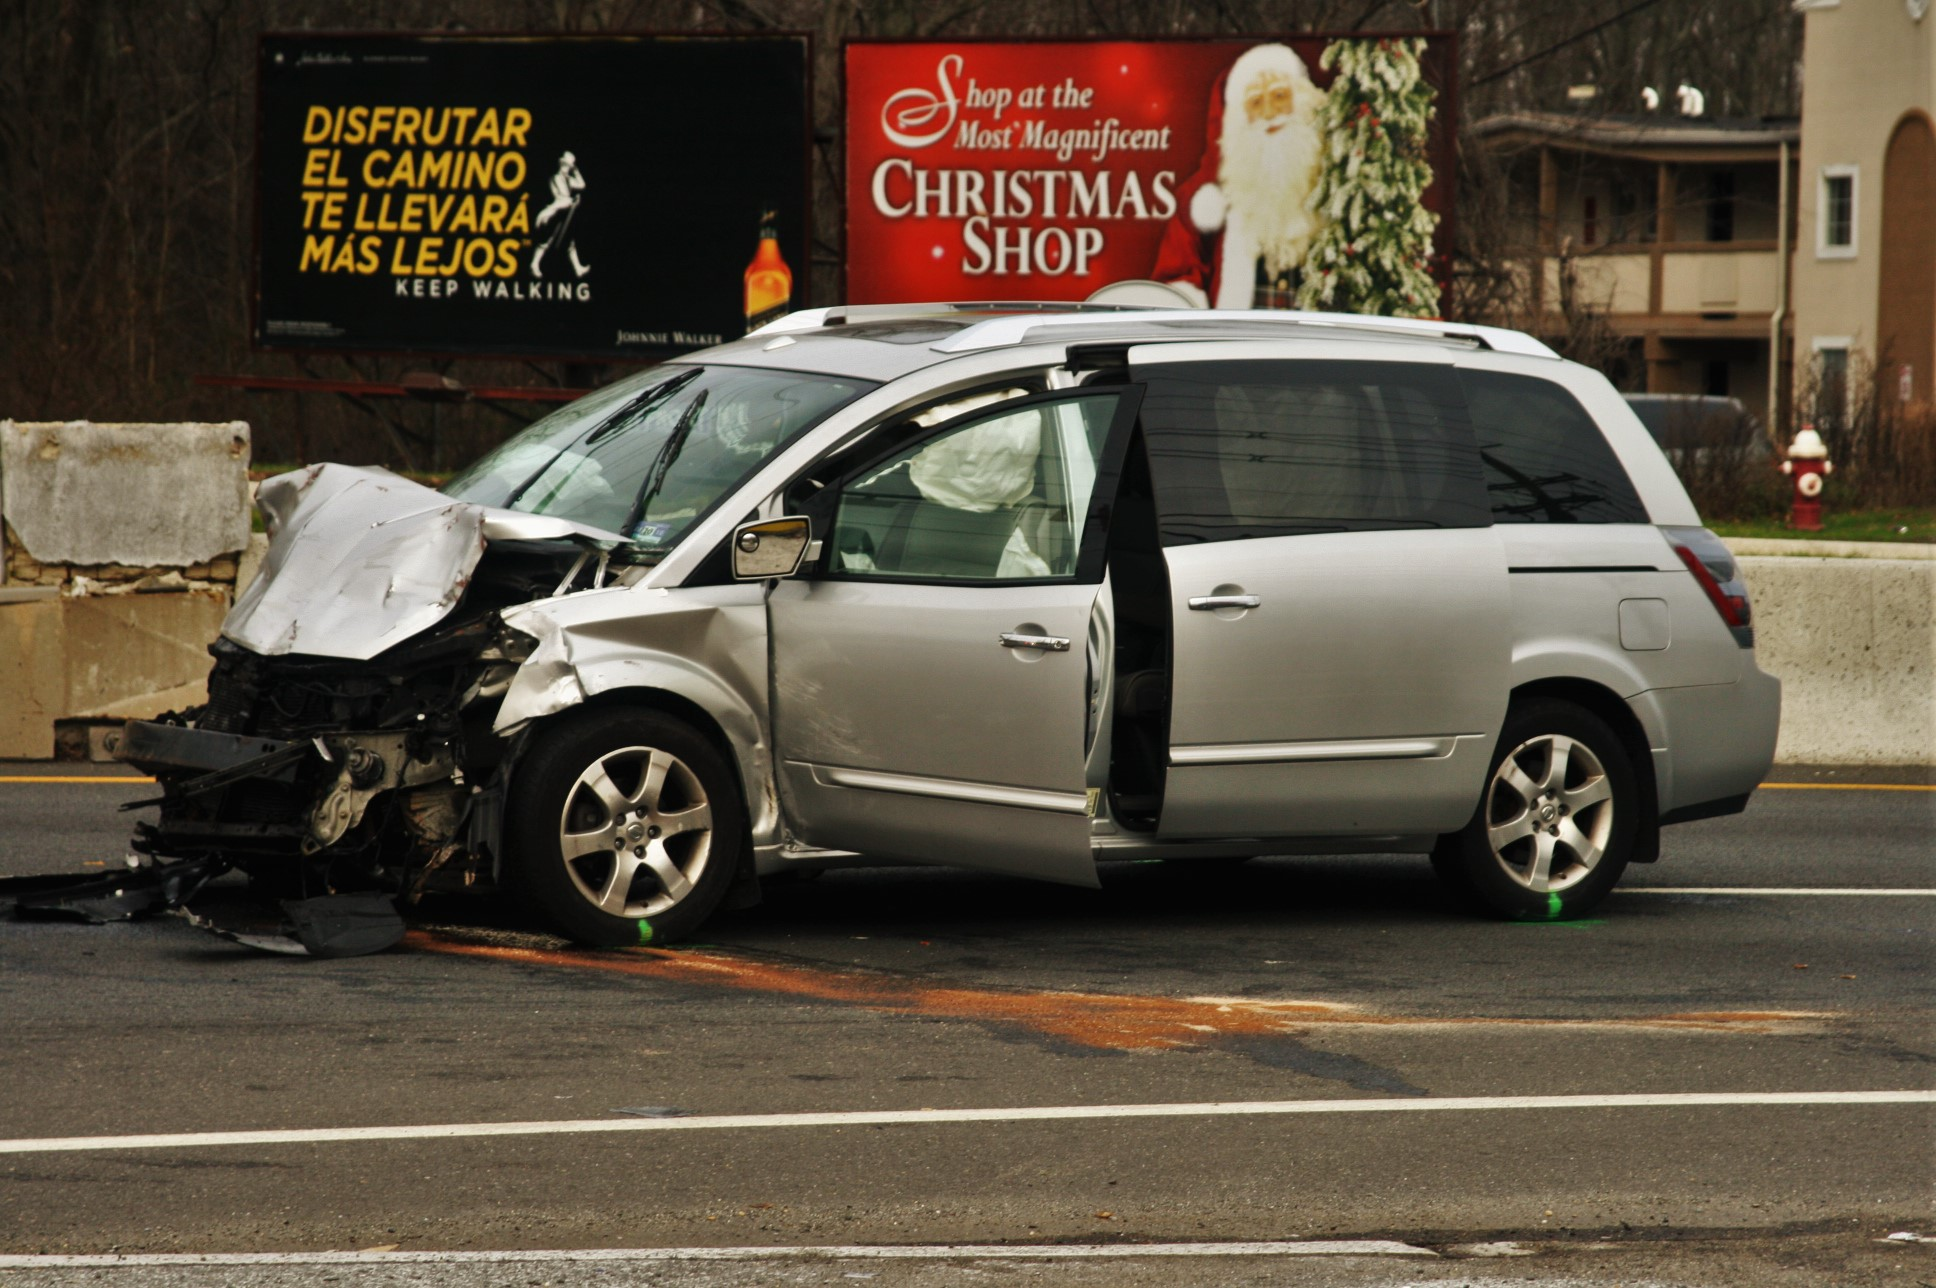 2181c3146668f9c9fb02_New_Years_accident4.JPG